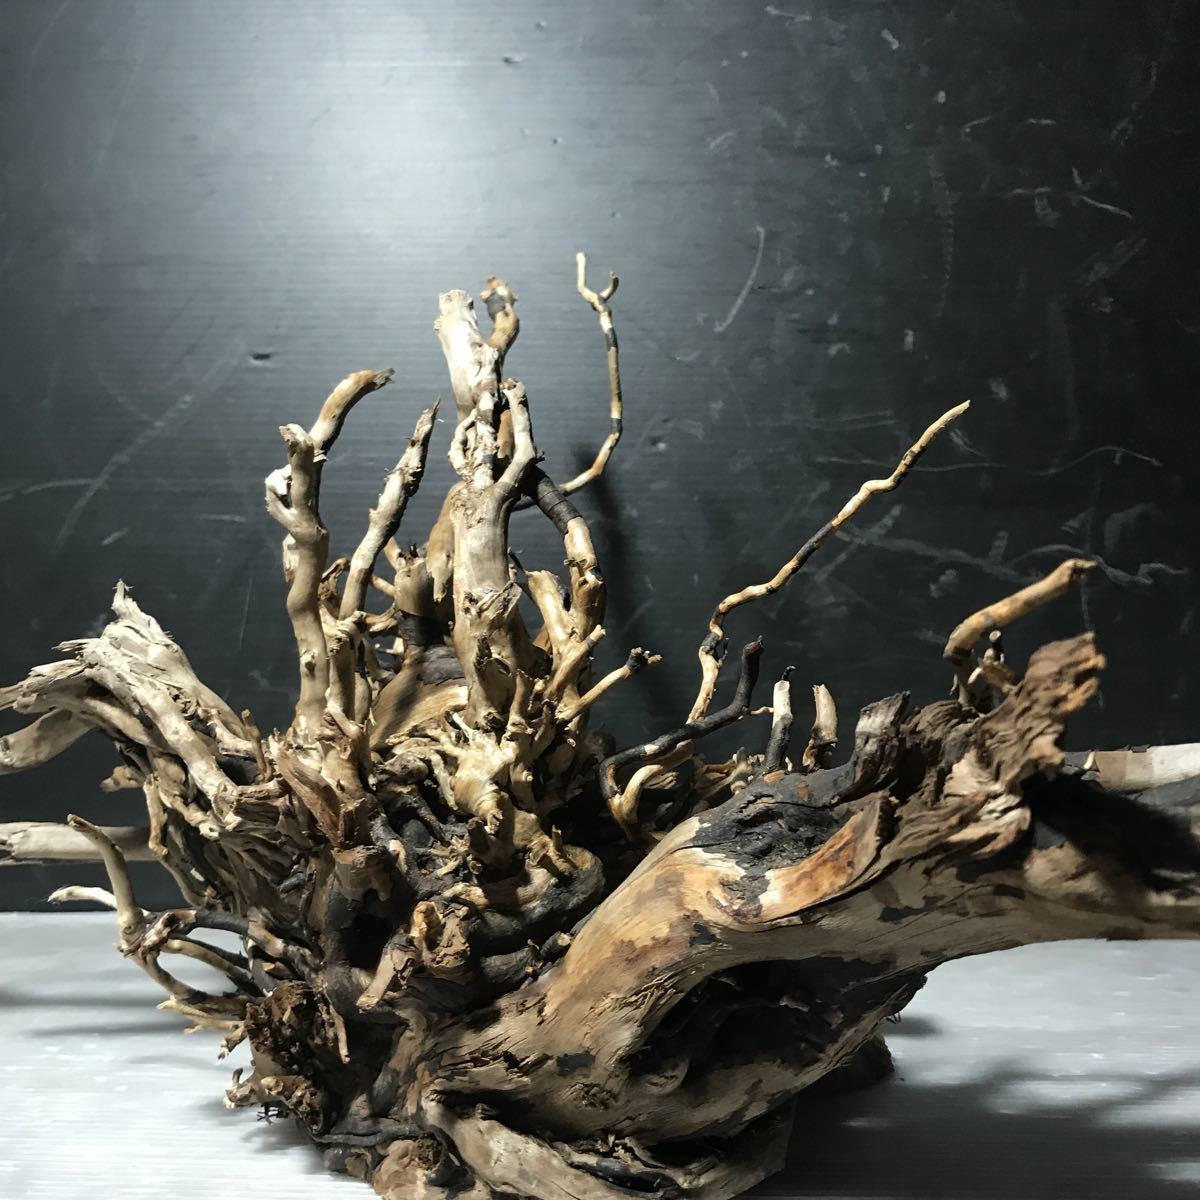 ☆sea tree☆煮沸消毒済み流木 ブランチ流木/水槽/アクアリウム/テラリウム/インテリア/ADA/サンゴ/置物_画像5